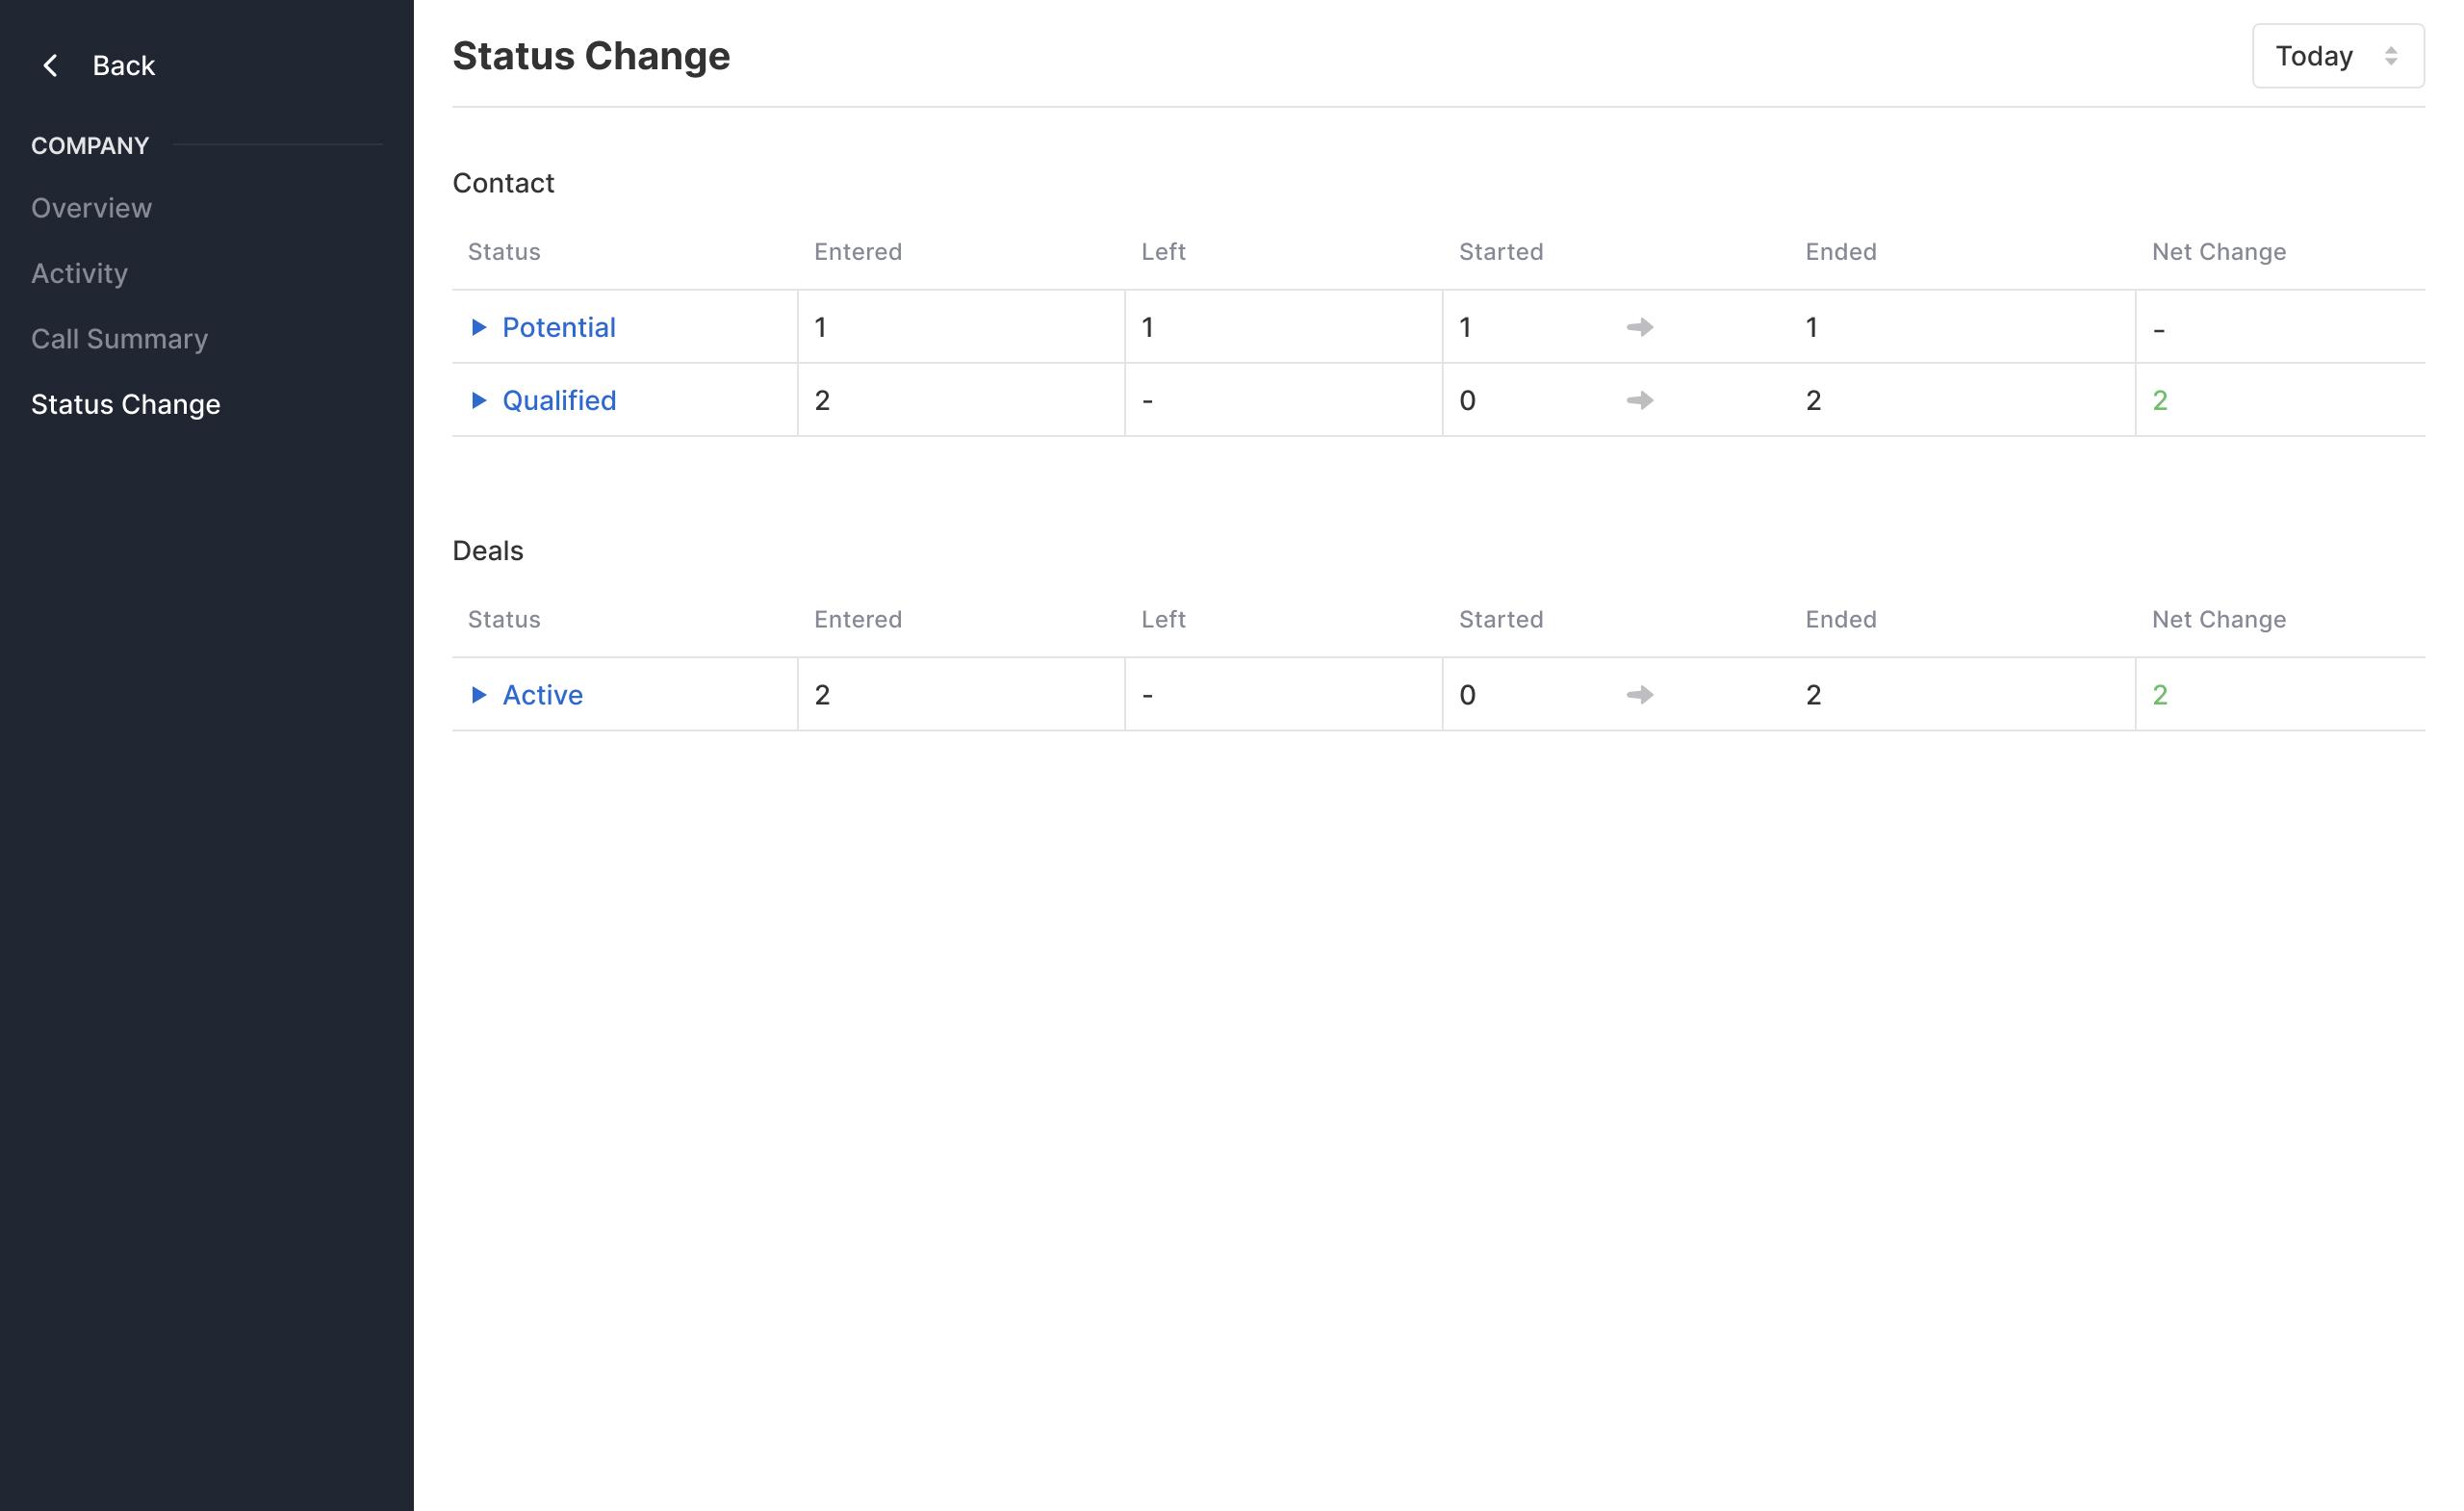 Status change report